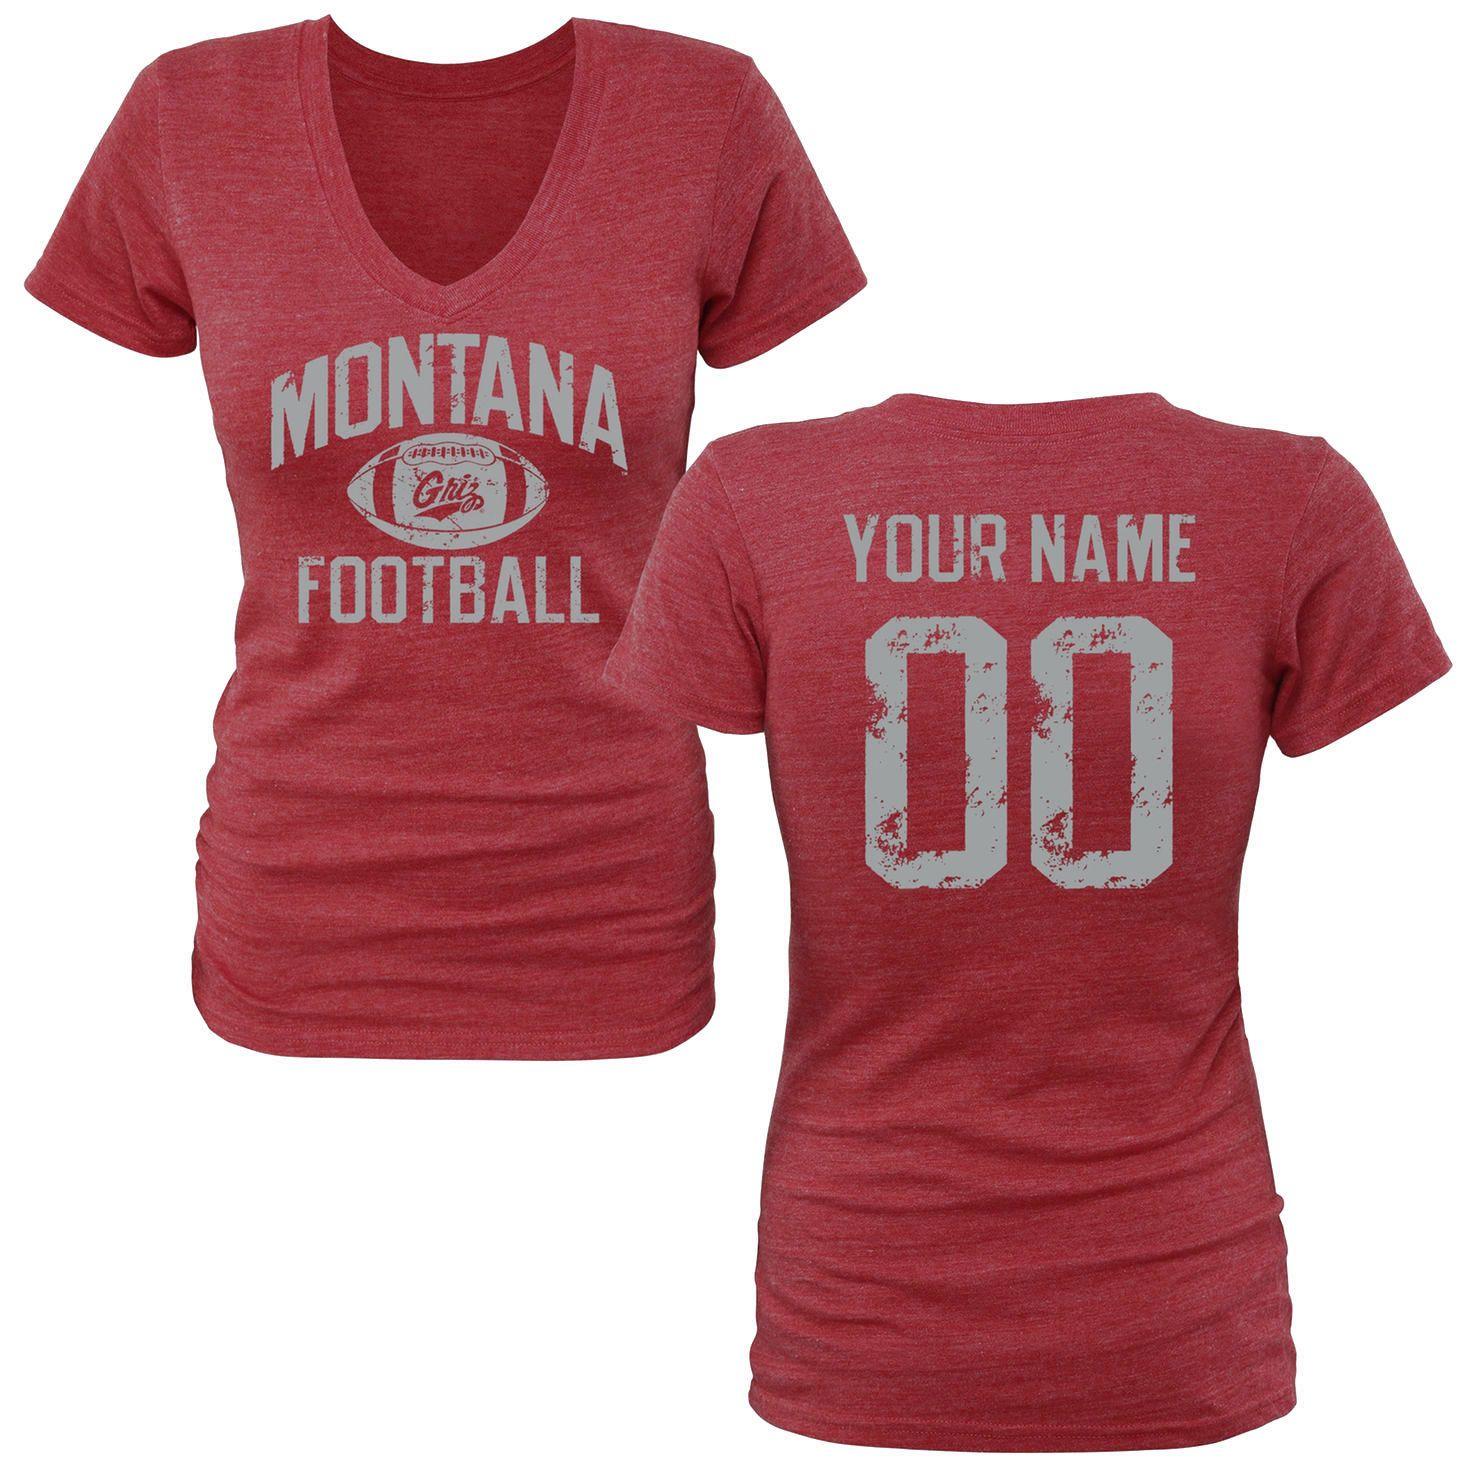 1315174242c Montana Grizzlies Women's Personalized Distressed Football Tri-Blend V-Neck  T-Shirt - Garnet - $42.99